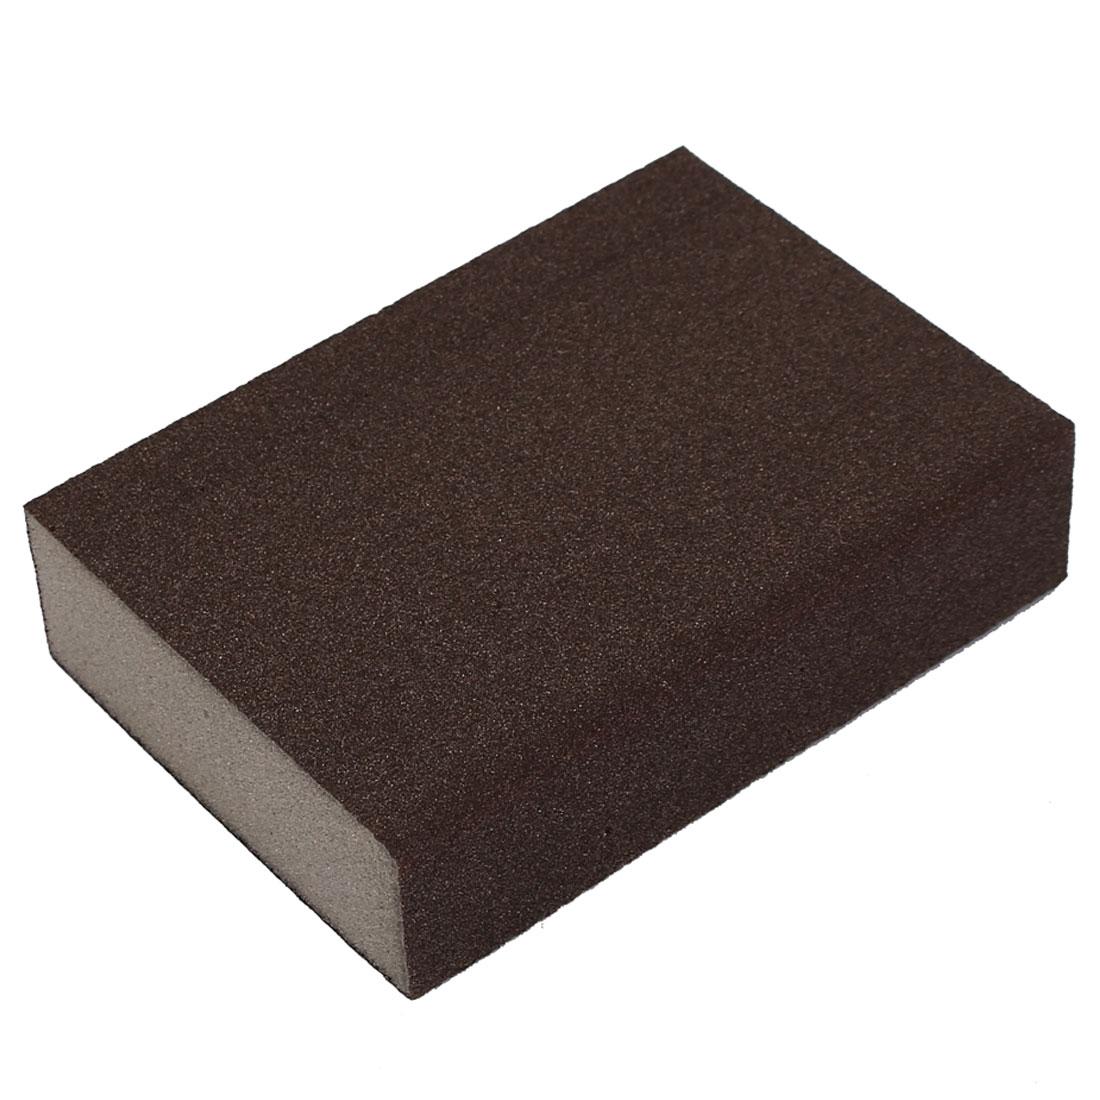 100mm x 70mm x 25mm 180 Grit Sponges Polishing Pad Sanding Block